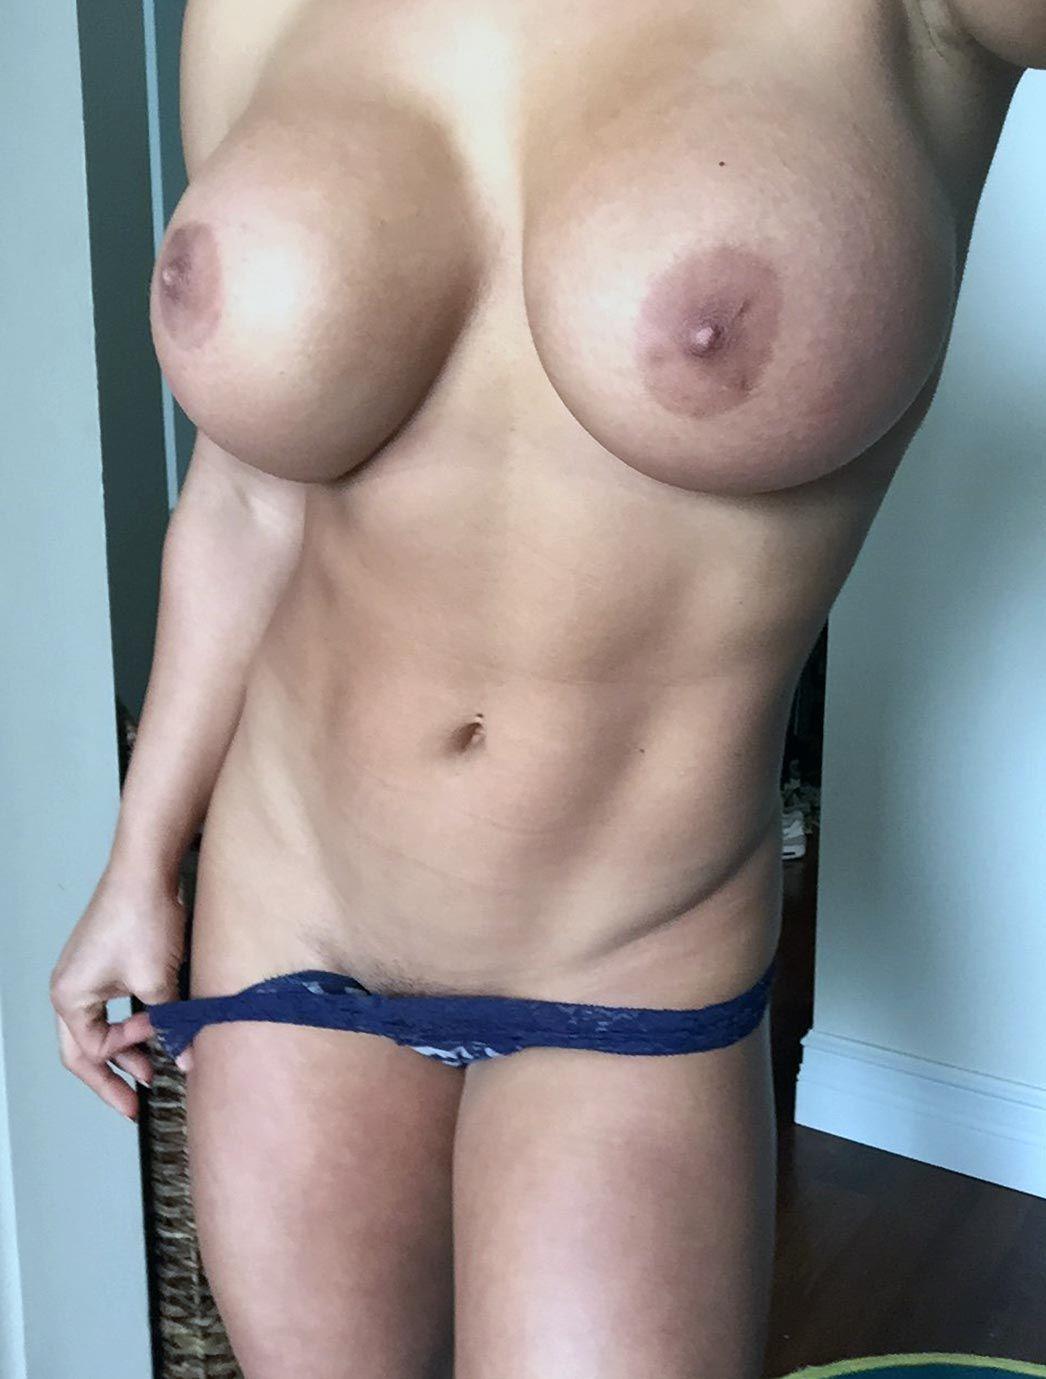 Celeste Bonin Nude Leaked The Fappening & Sexy 0203